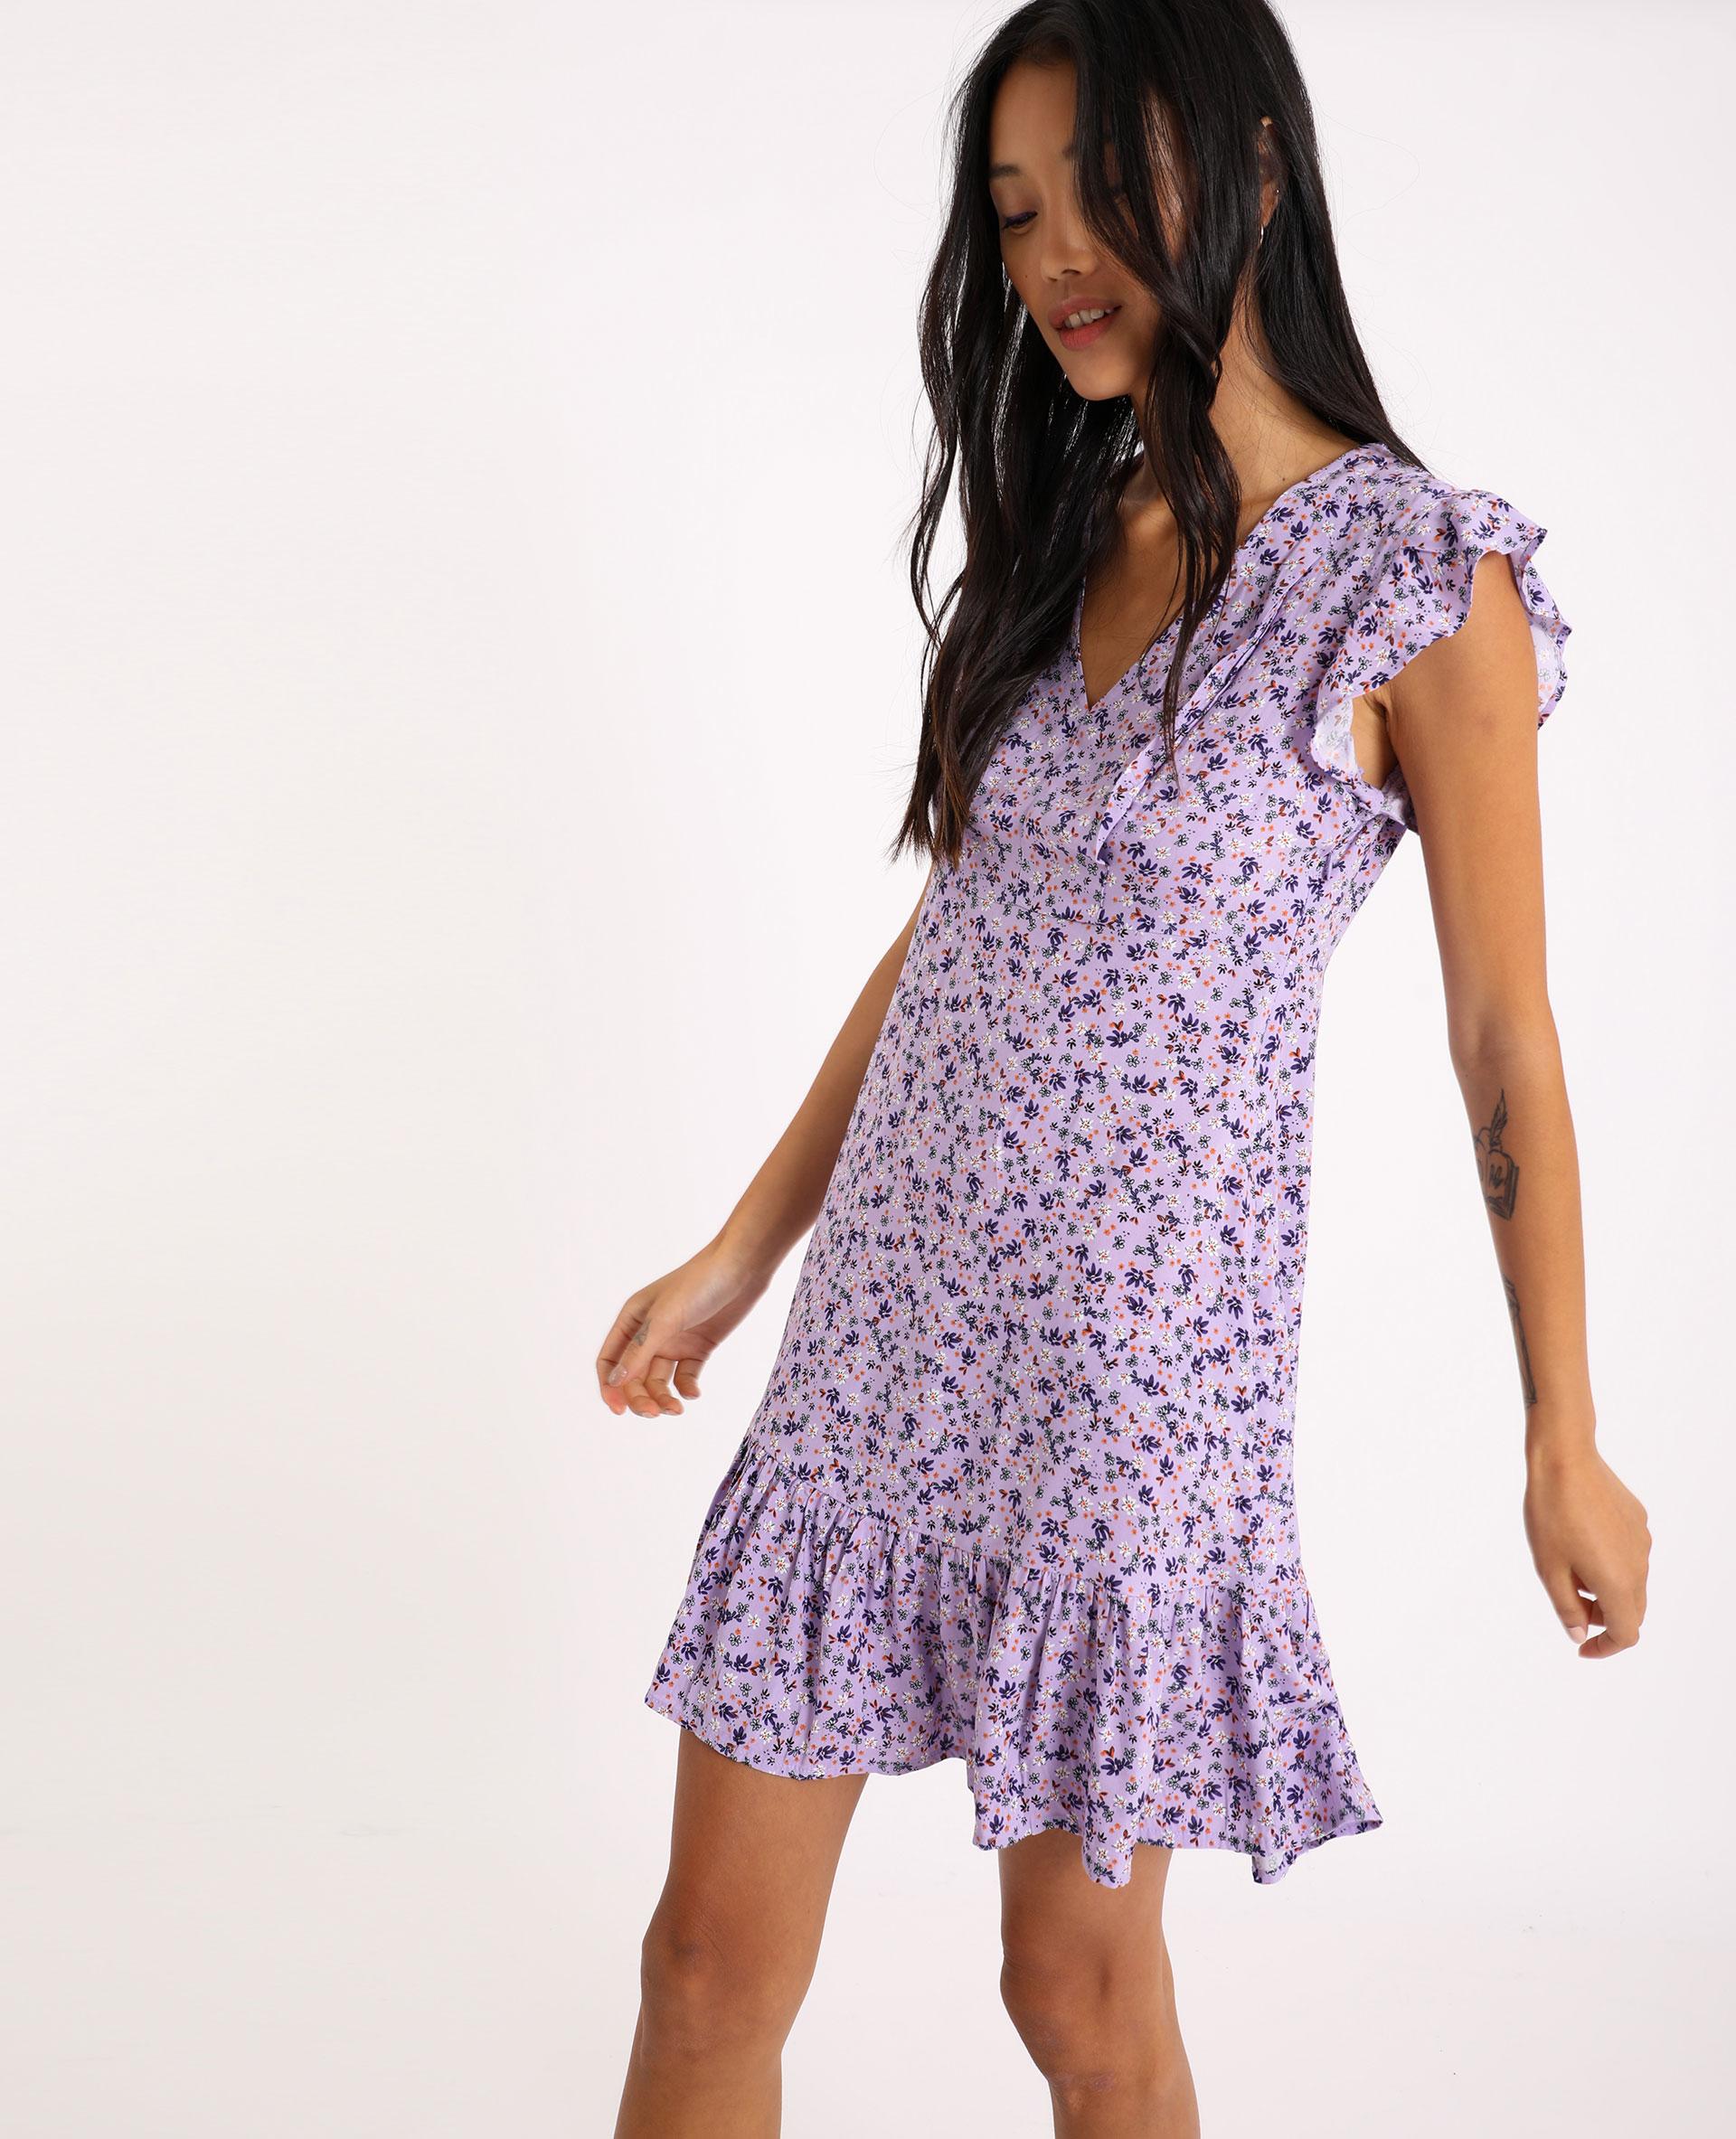 Robe à fleurs lilas - Pimkie